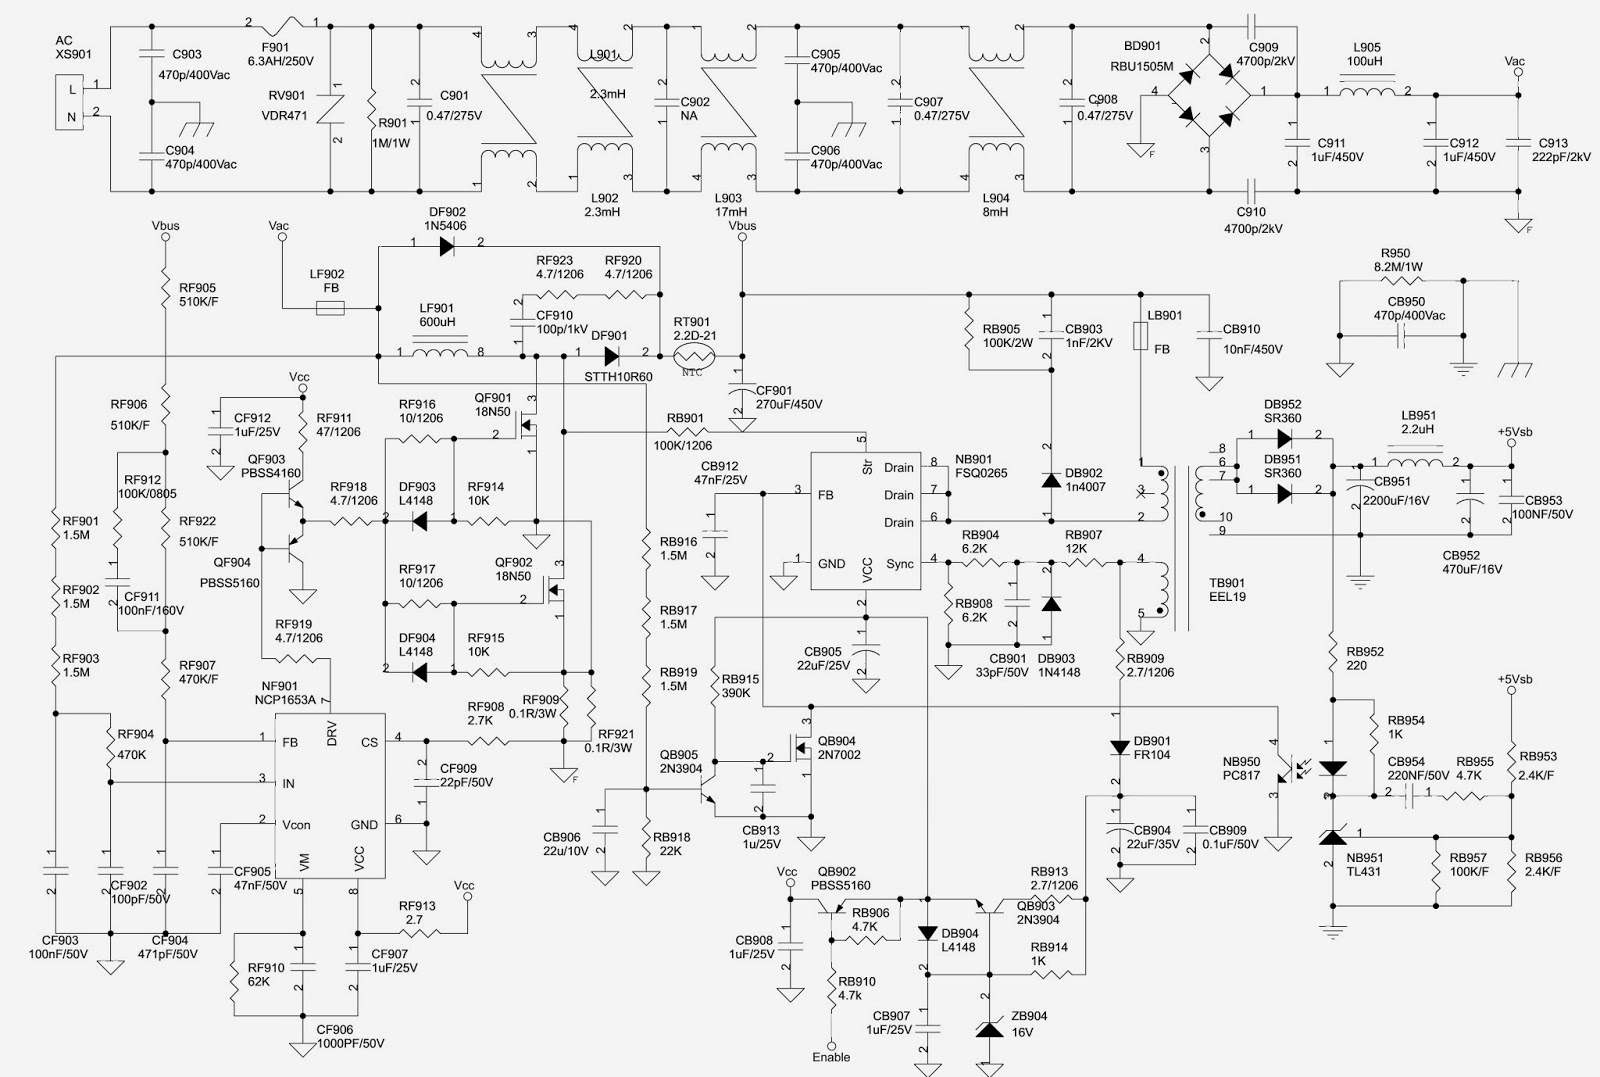 xv550xv600da lcd tv power supply schematic circuit diagram 1 10toshiba xv550 xv600da lcd tv power supply [ 1600 x 1077 Pixel ]